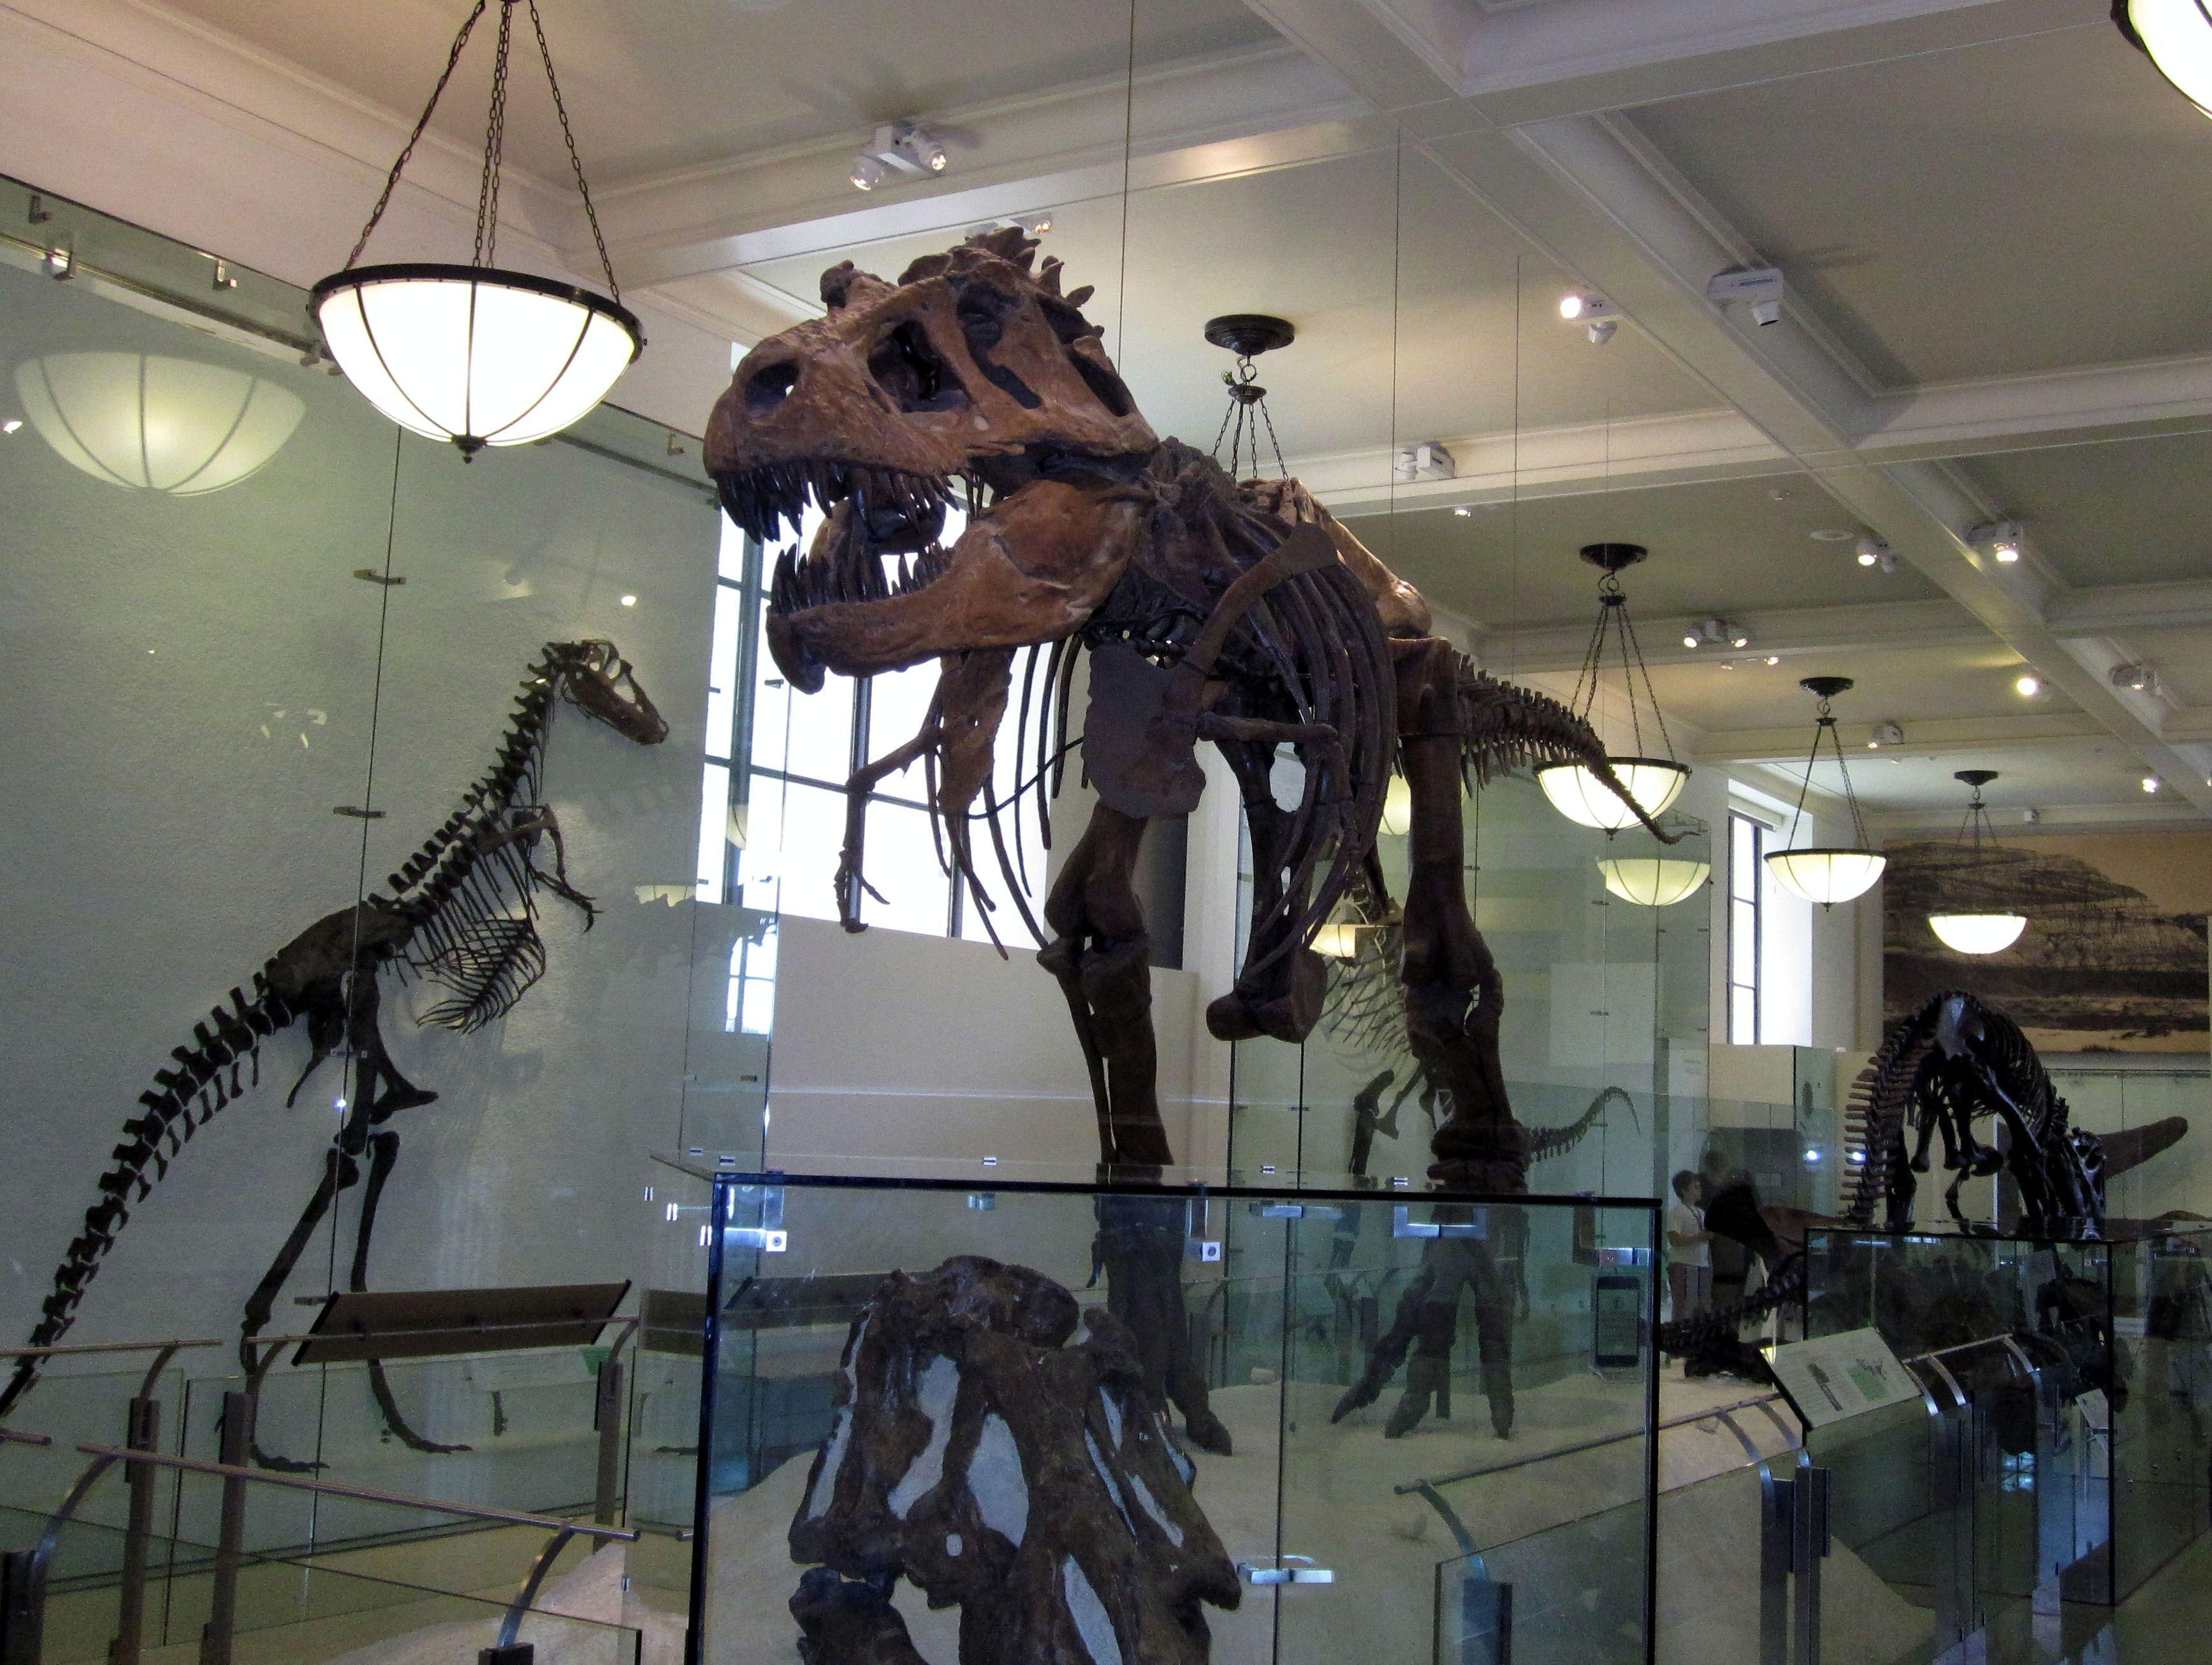 c77985a6d84068f006da19ff8782ff33 - How Do I Get To The Museum Of Natural History